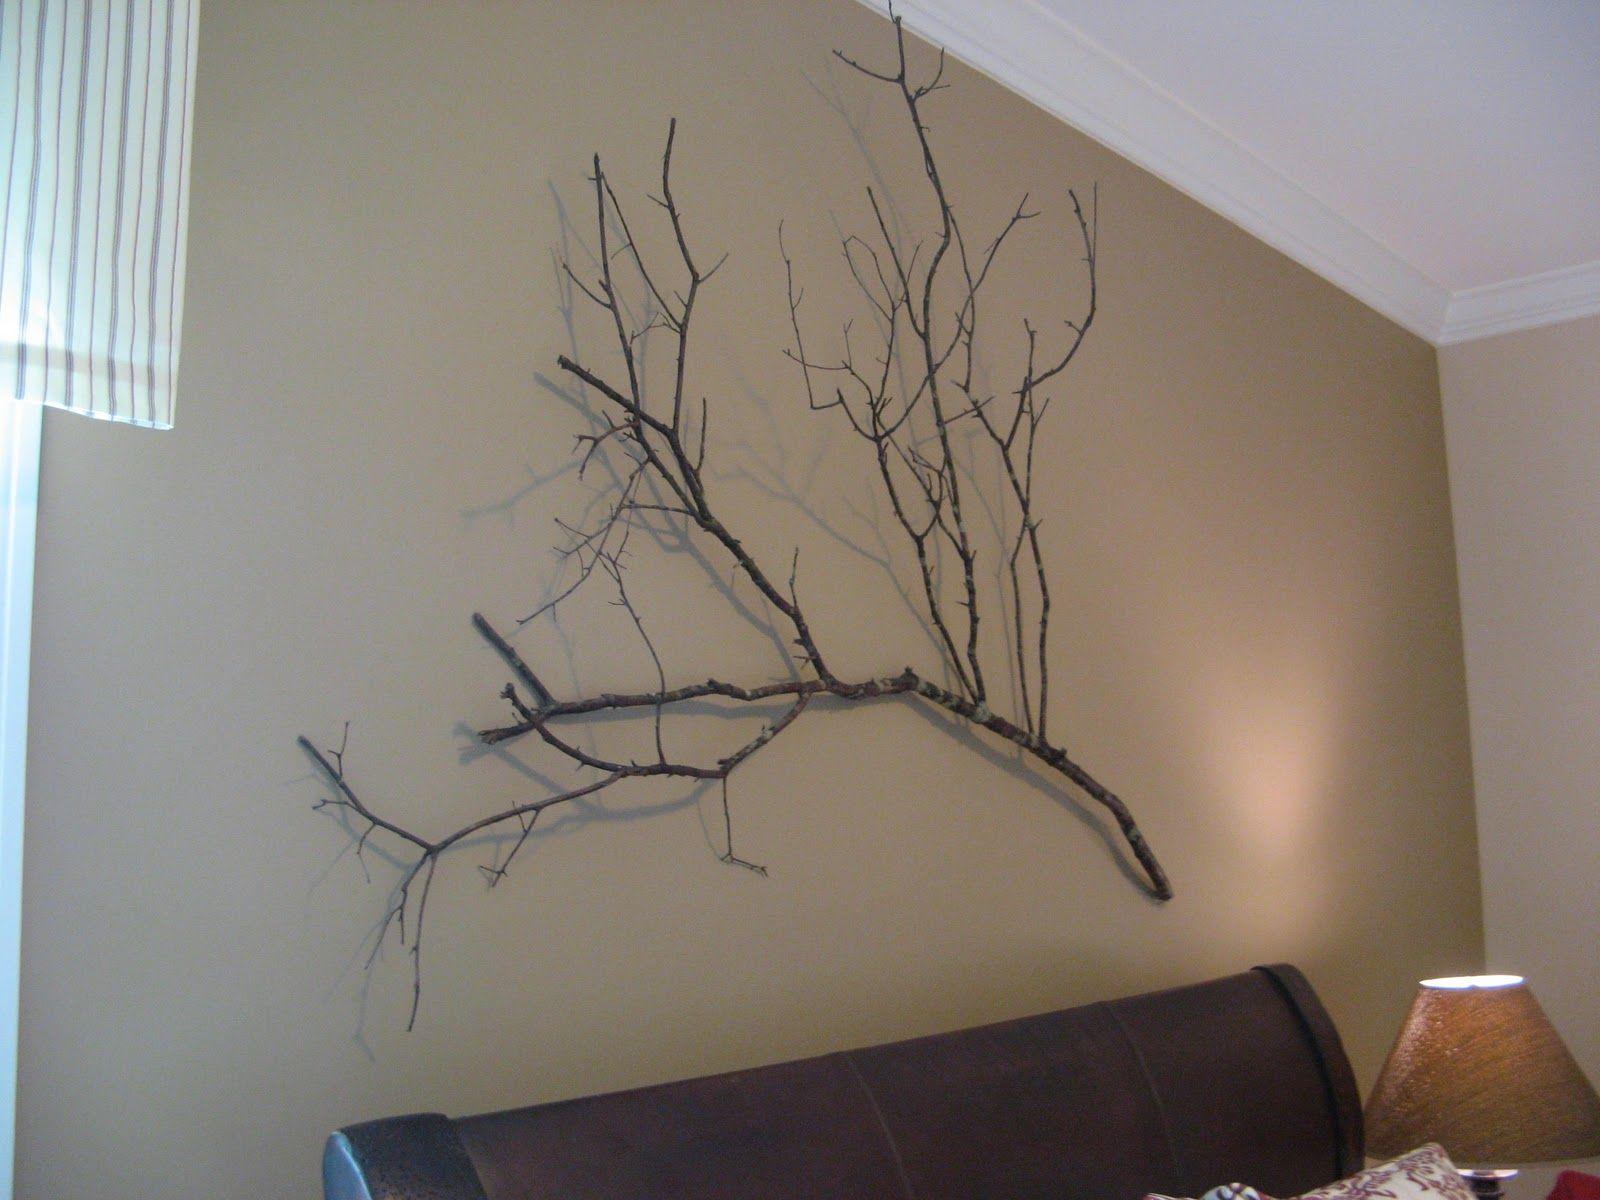 tree branch wall art - Design Decoration